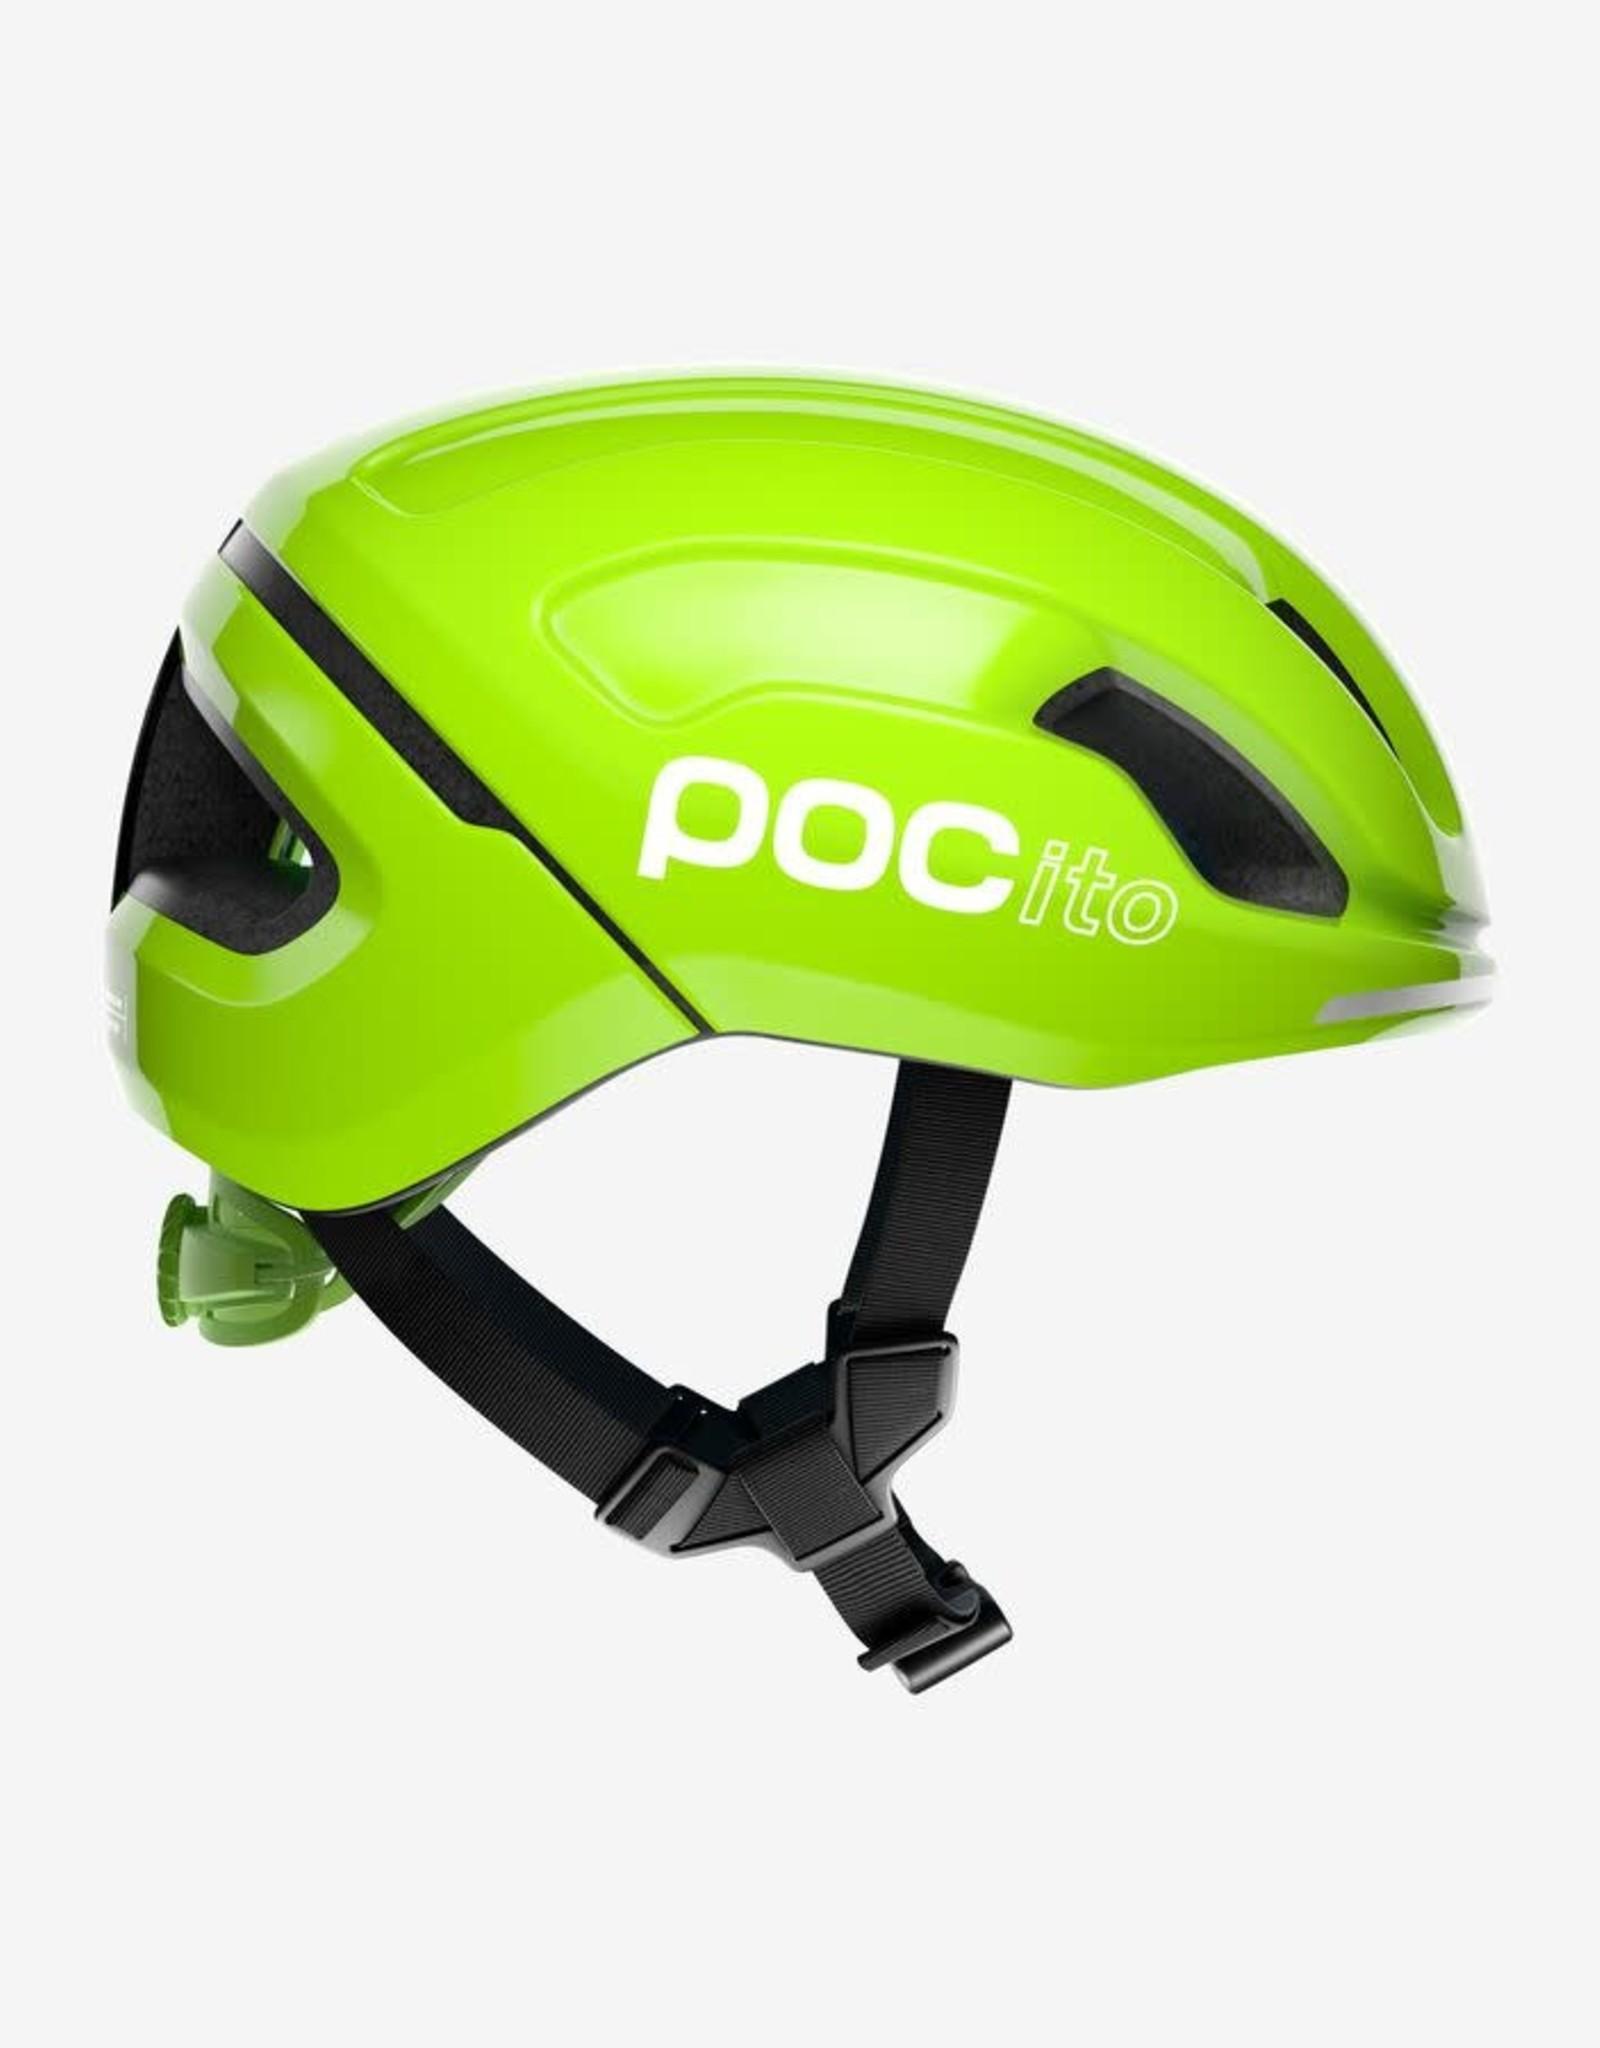 POC POCito Omne SPIN - Green